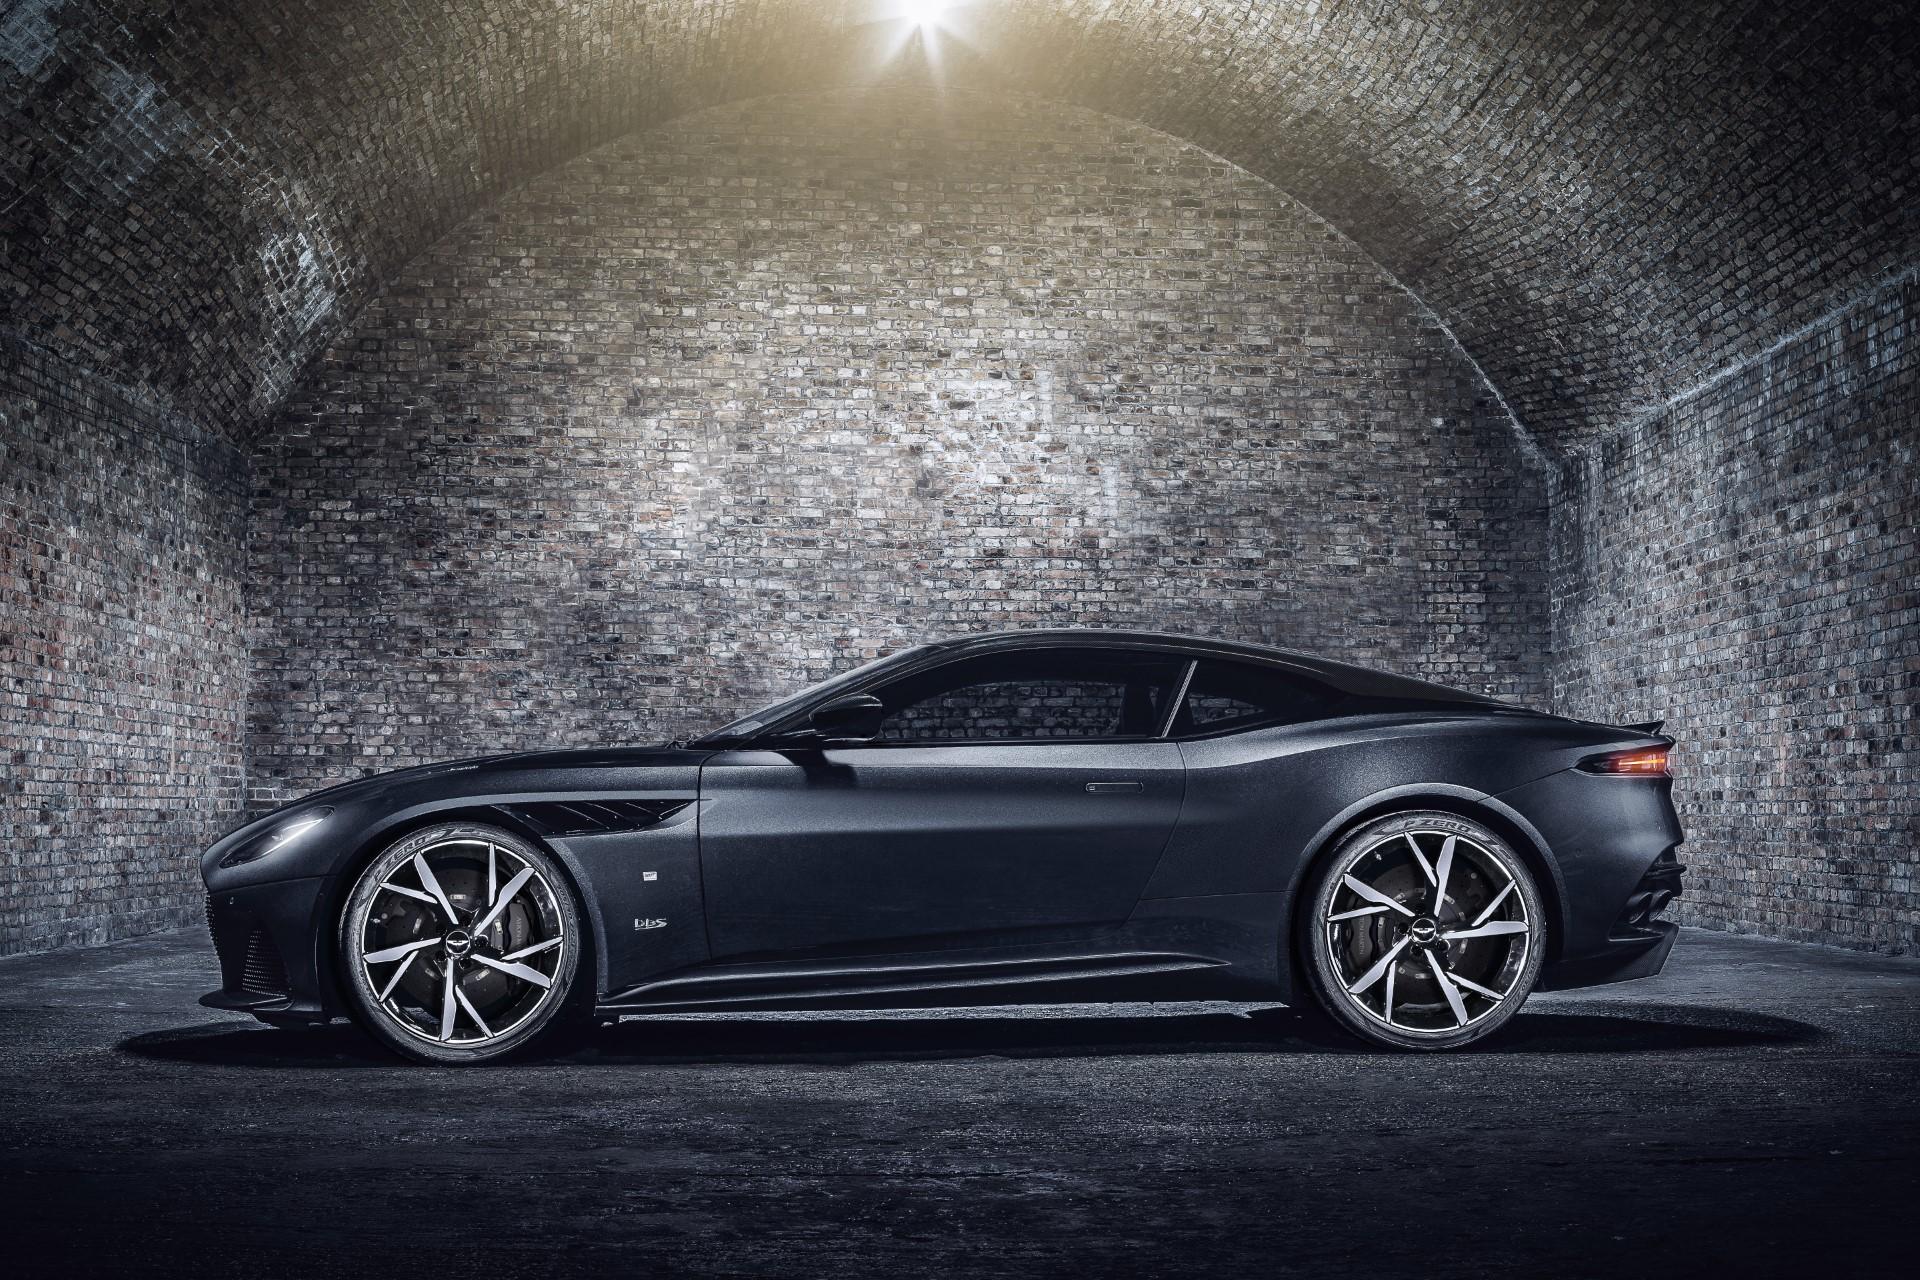 Aston Martin Vantage 007 Edition Watch I Love